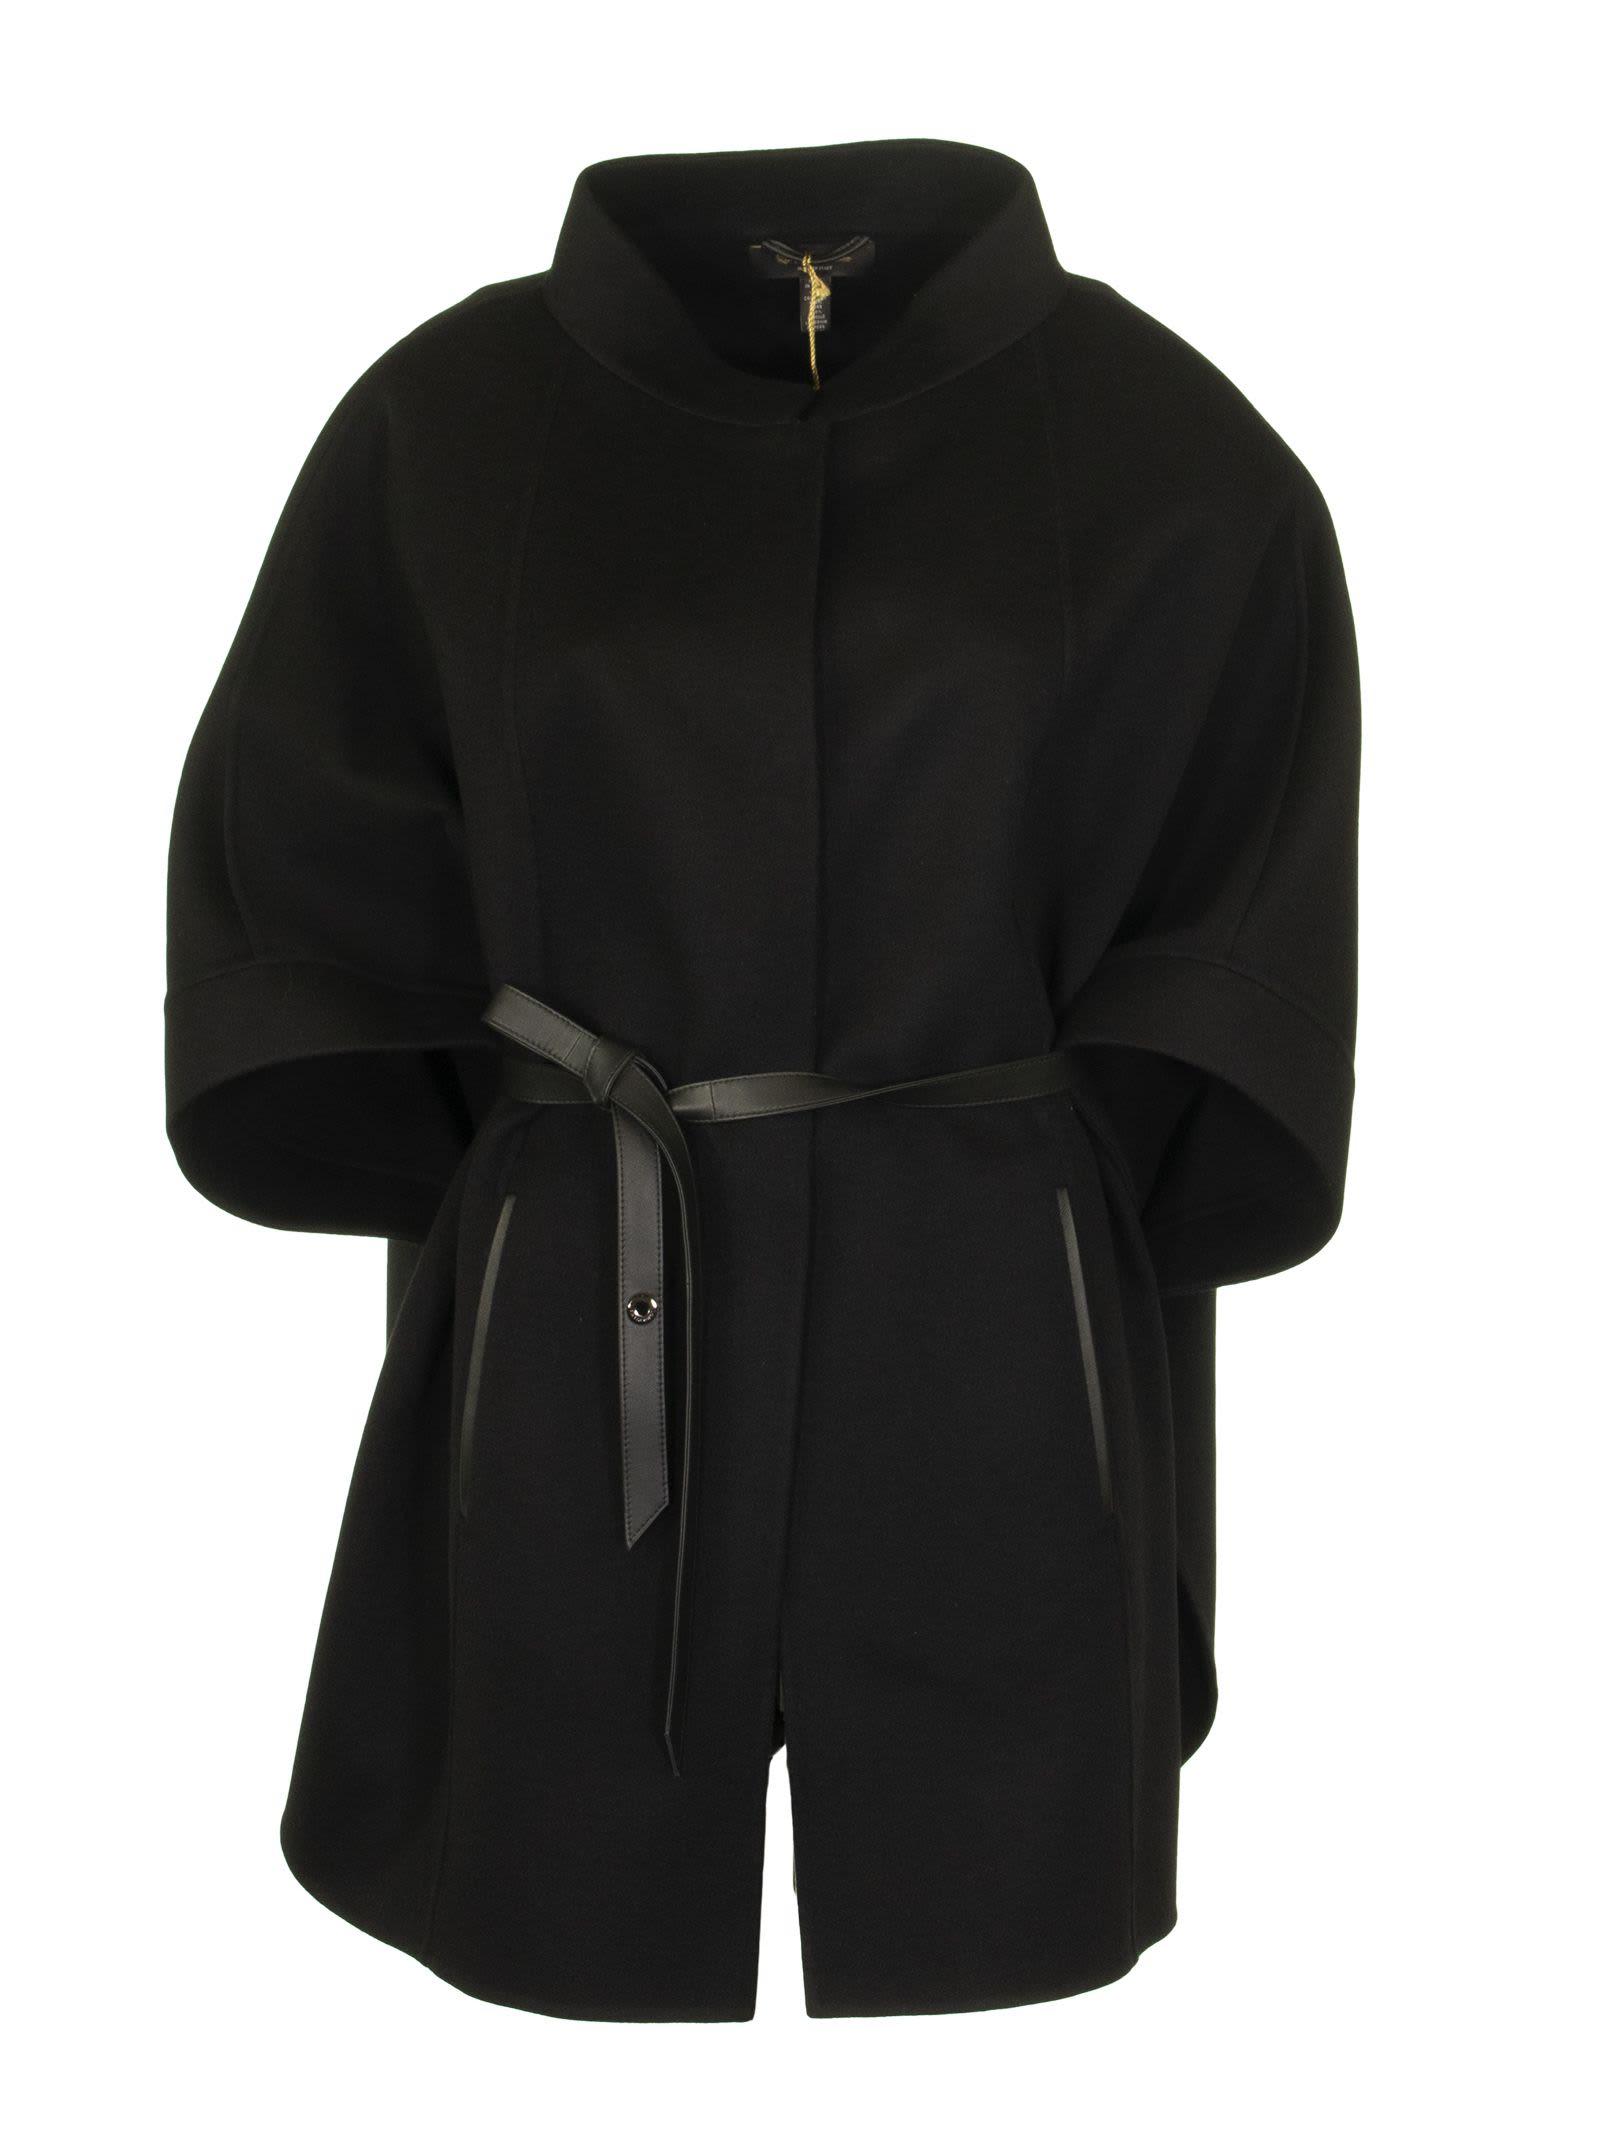 Loro Piana Salzburg Cape Black Cashmere Coat